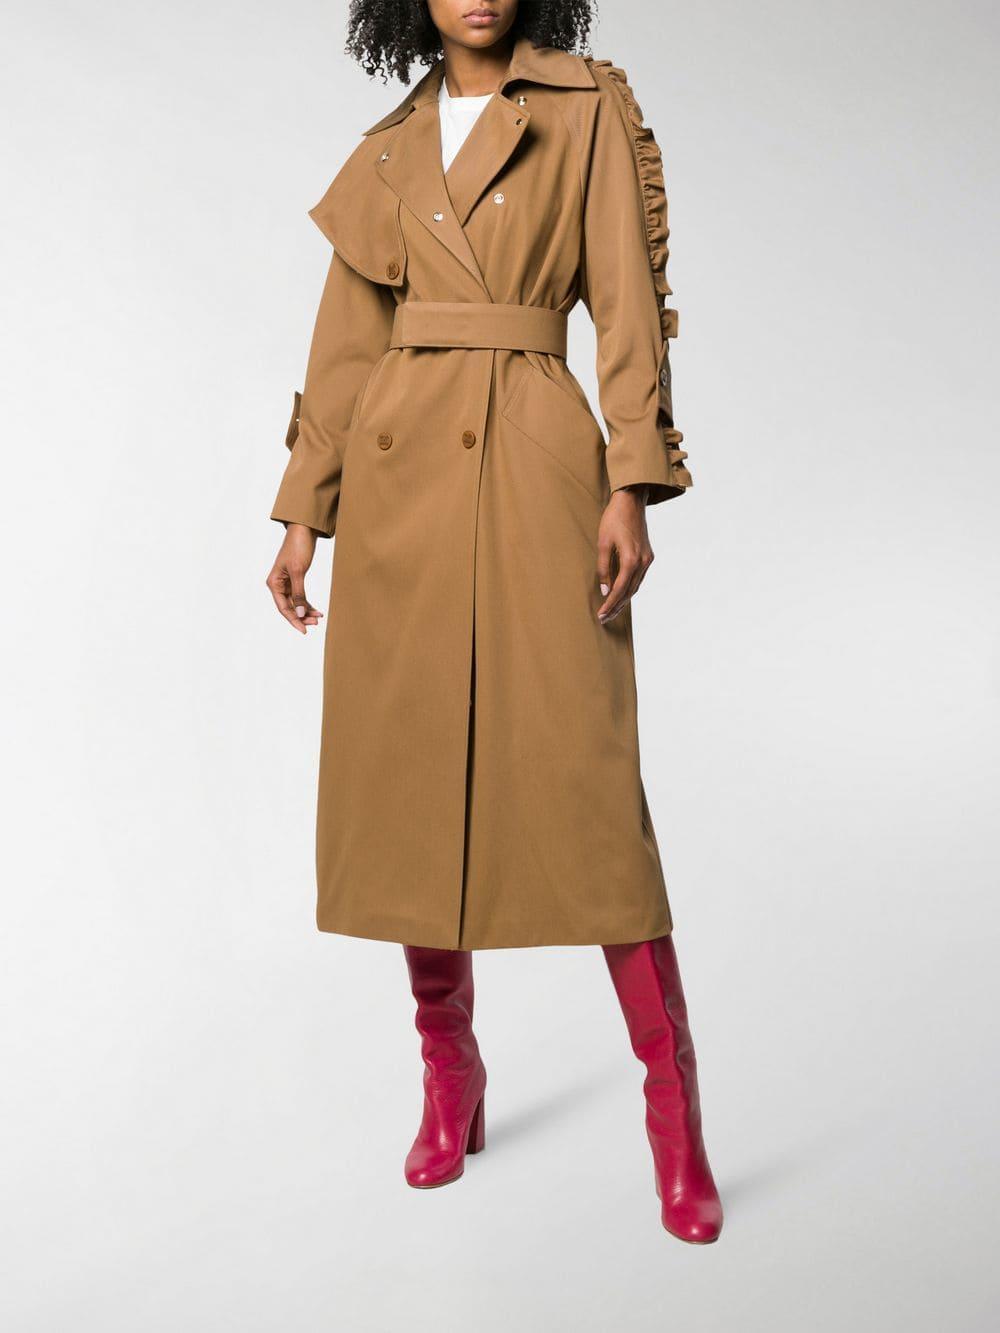 0522c1b69db Lyst - Max Mara Ruffle Sleeve Trench Coat in Brown